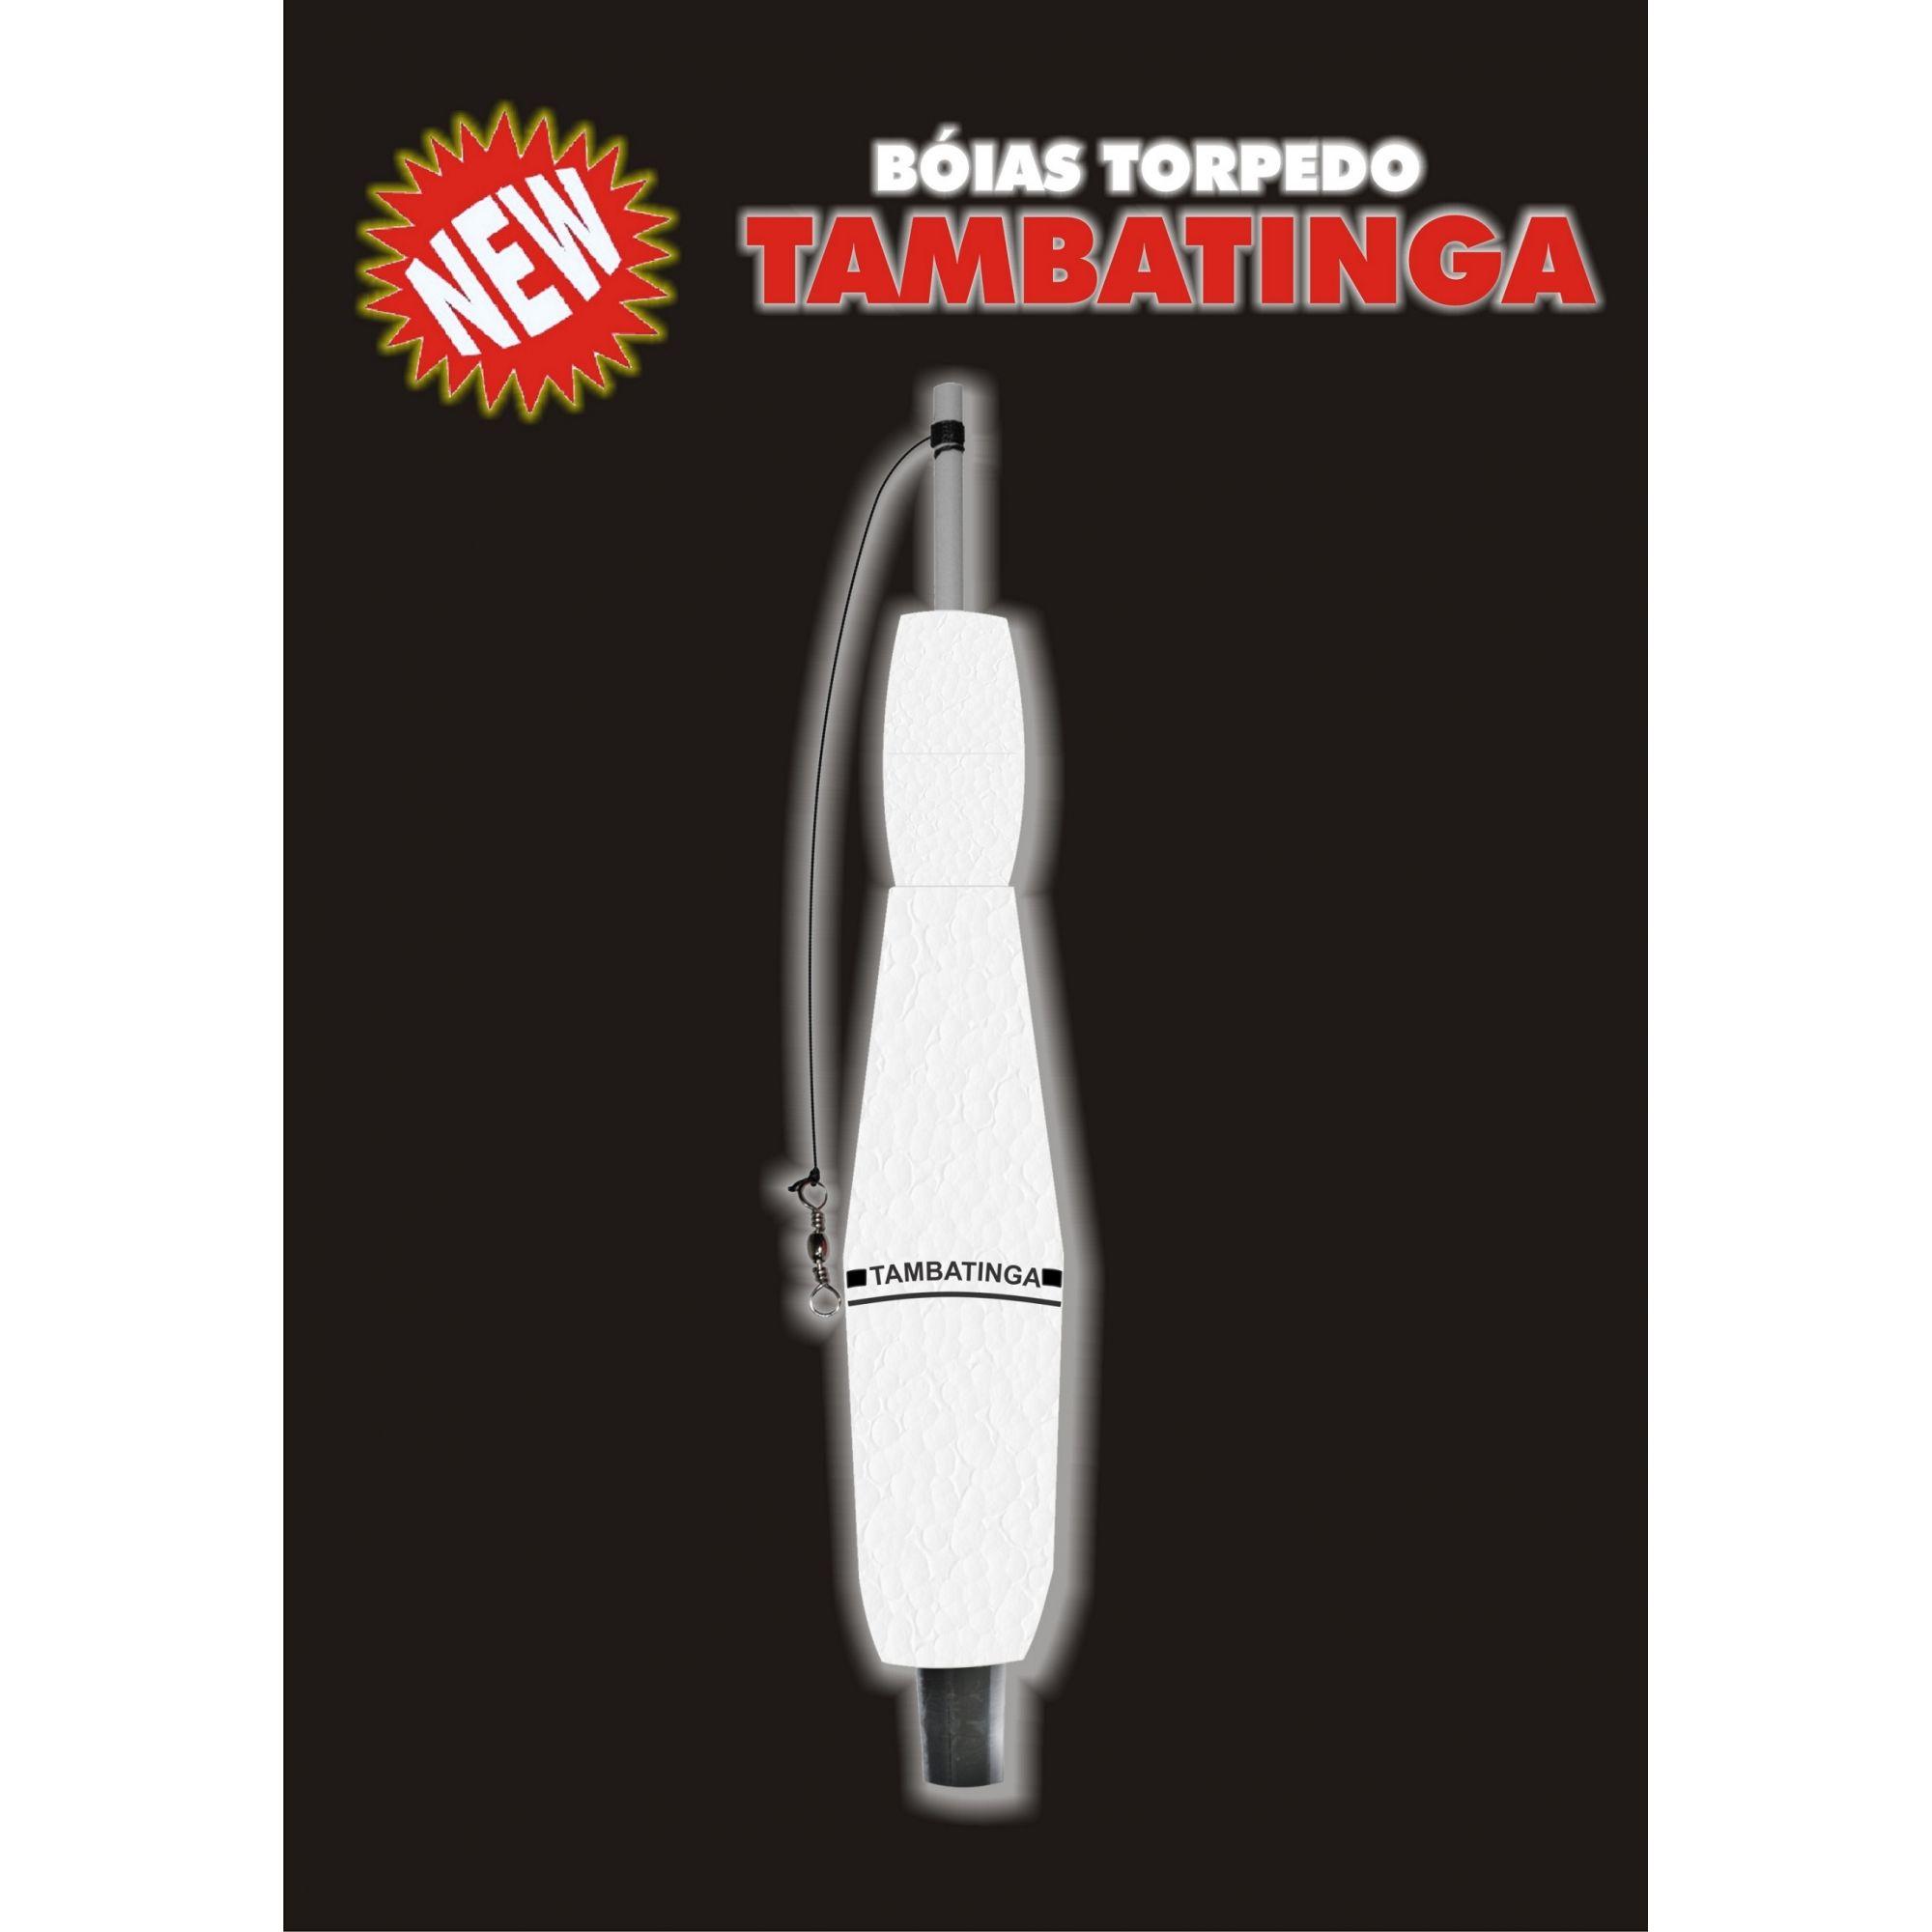 Boia Torpedo Tambaqui JR - Ref. 234/235/239